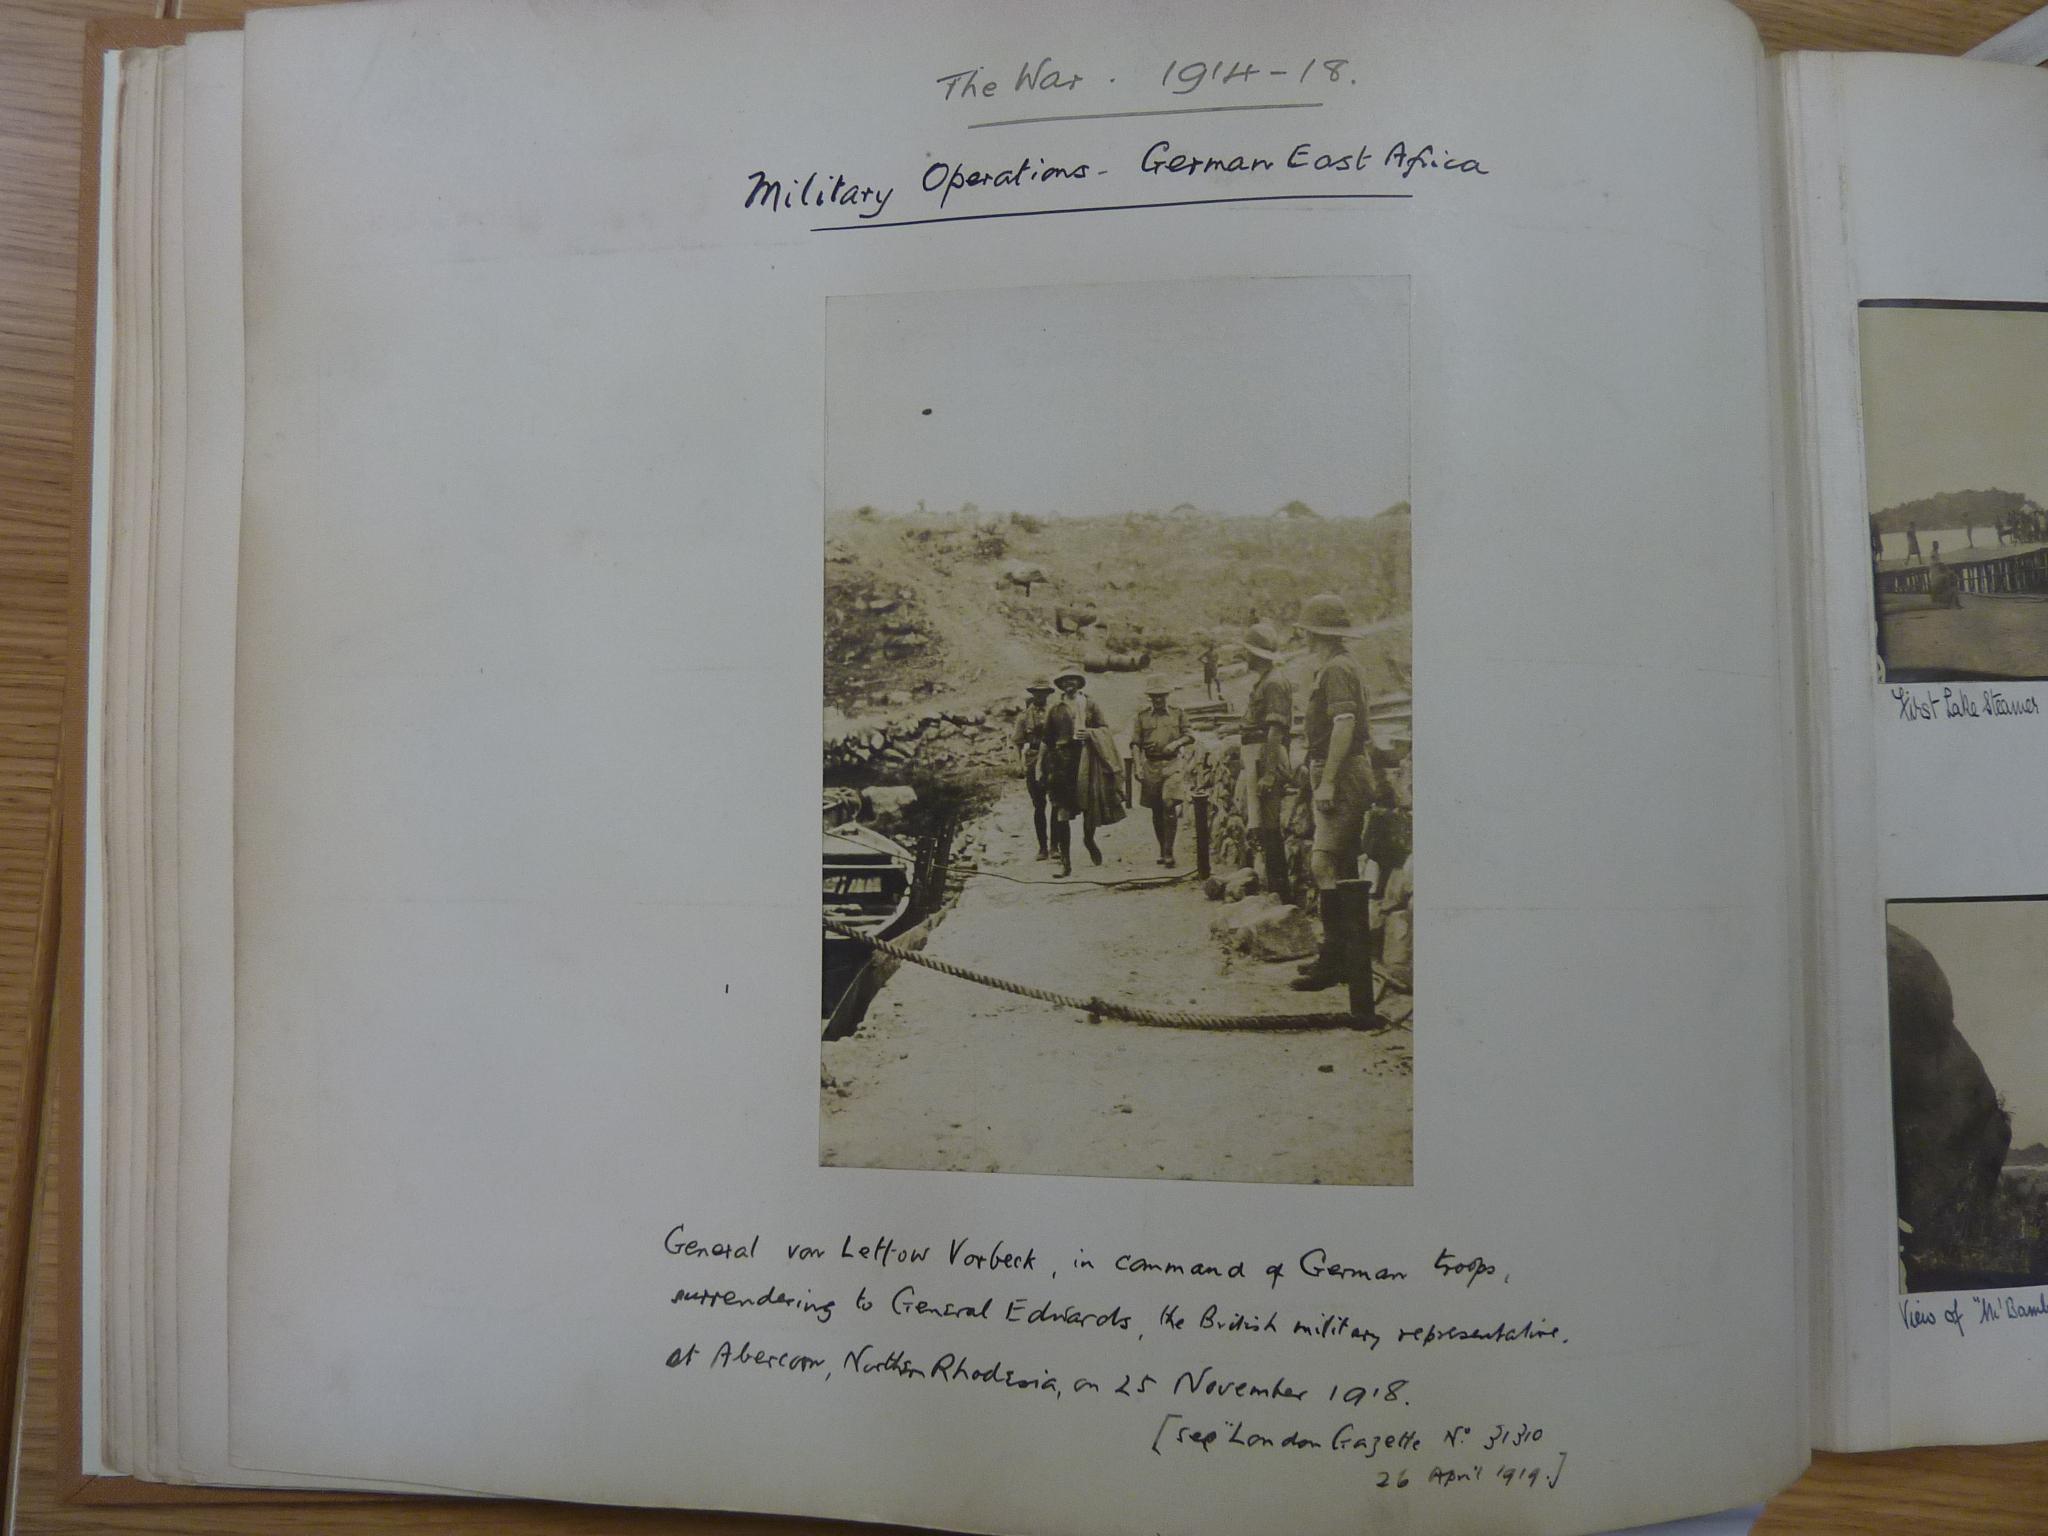 Lettow-Vorbeck surrender